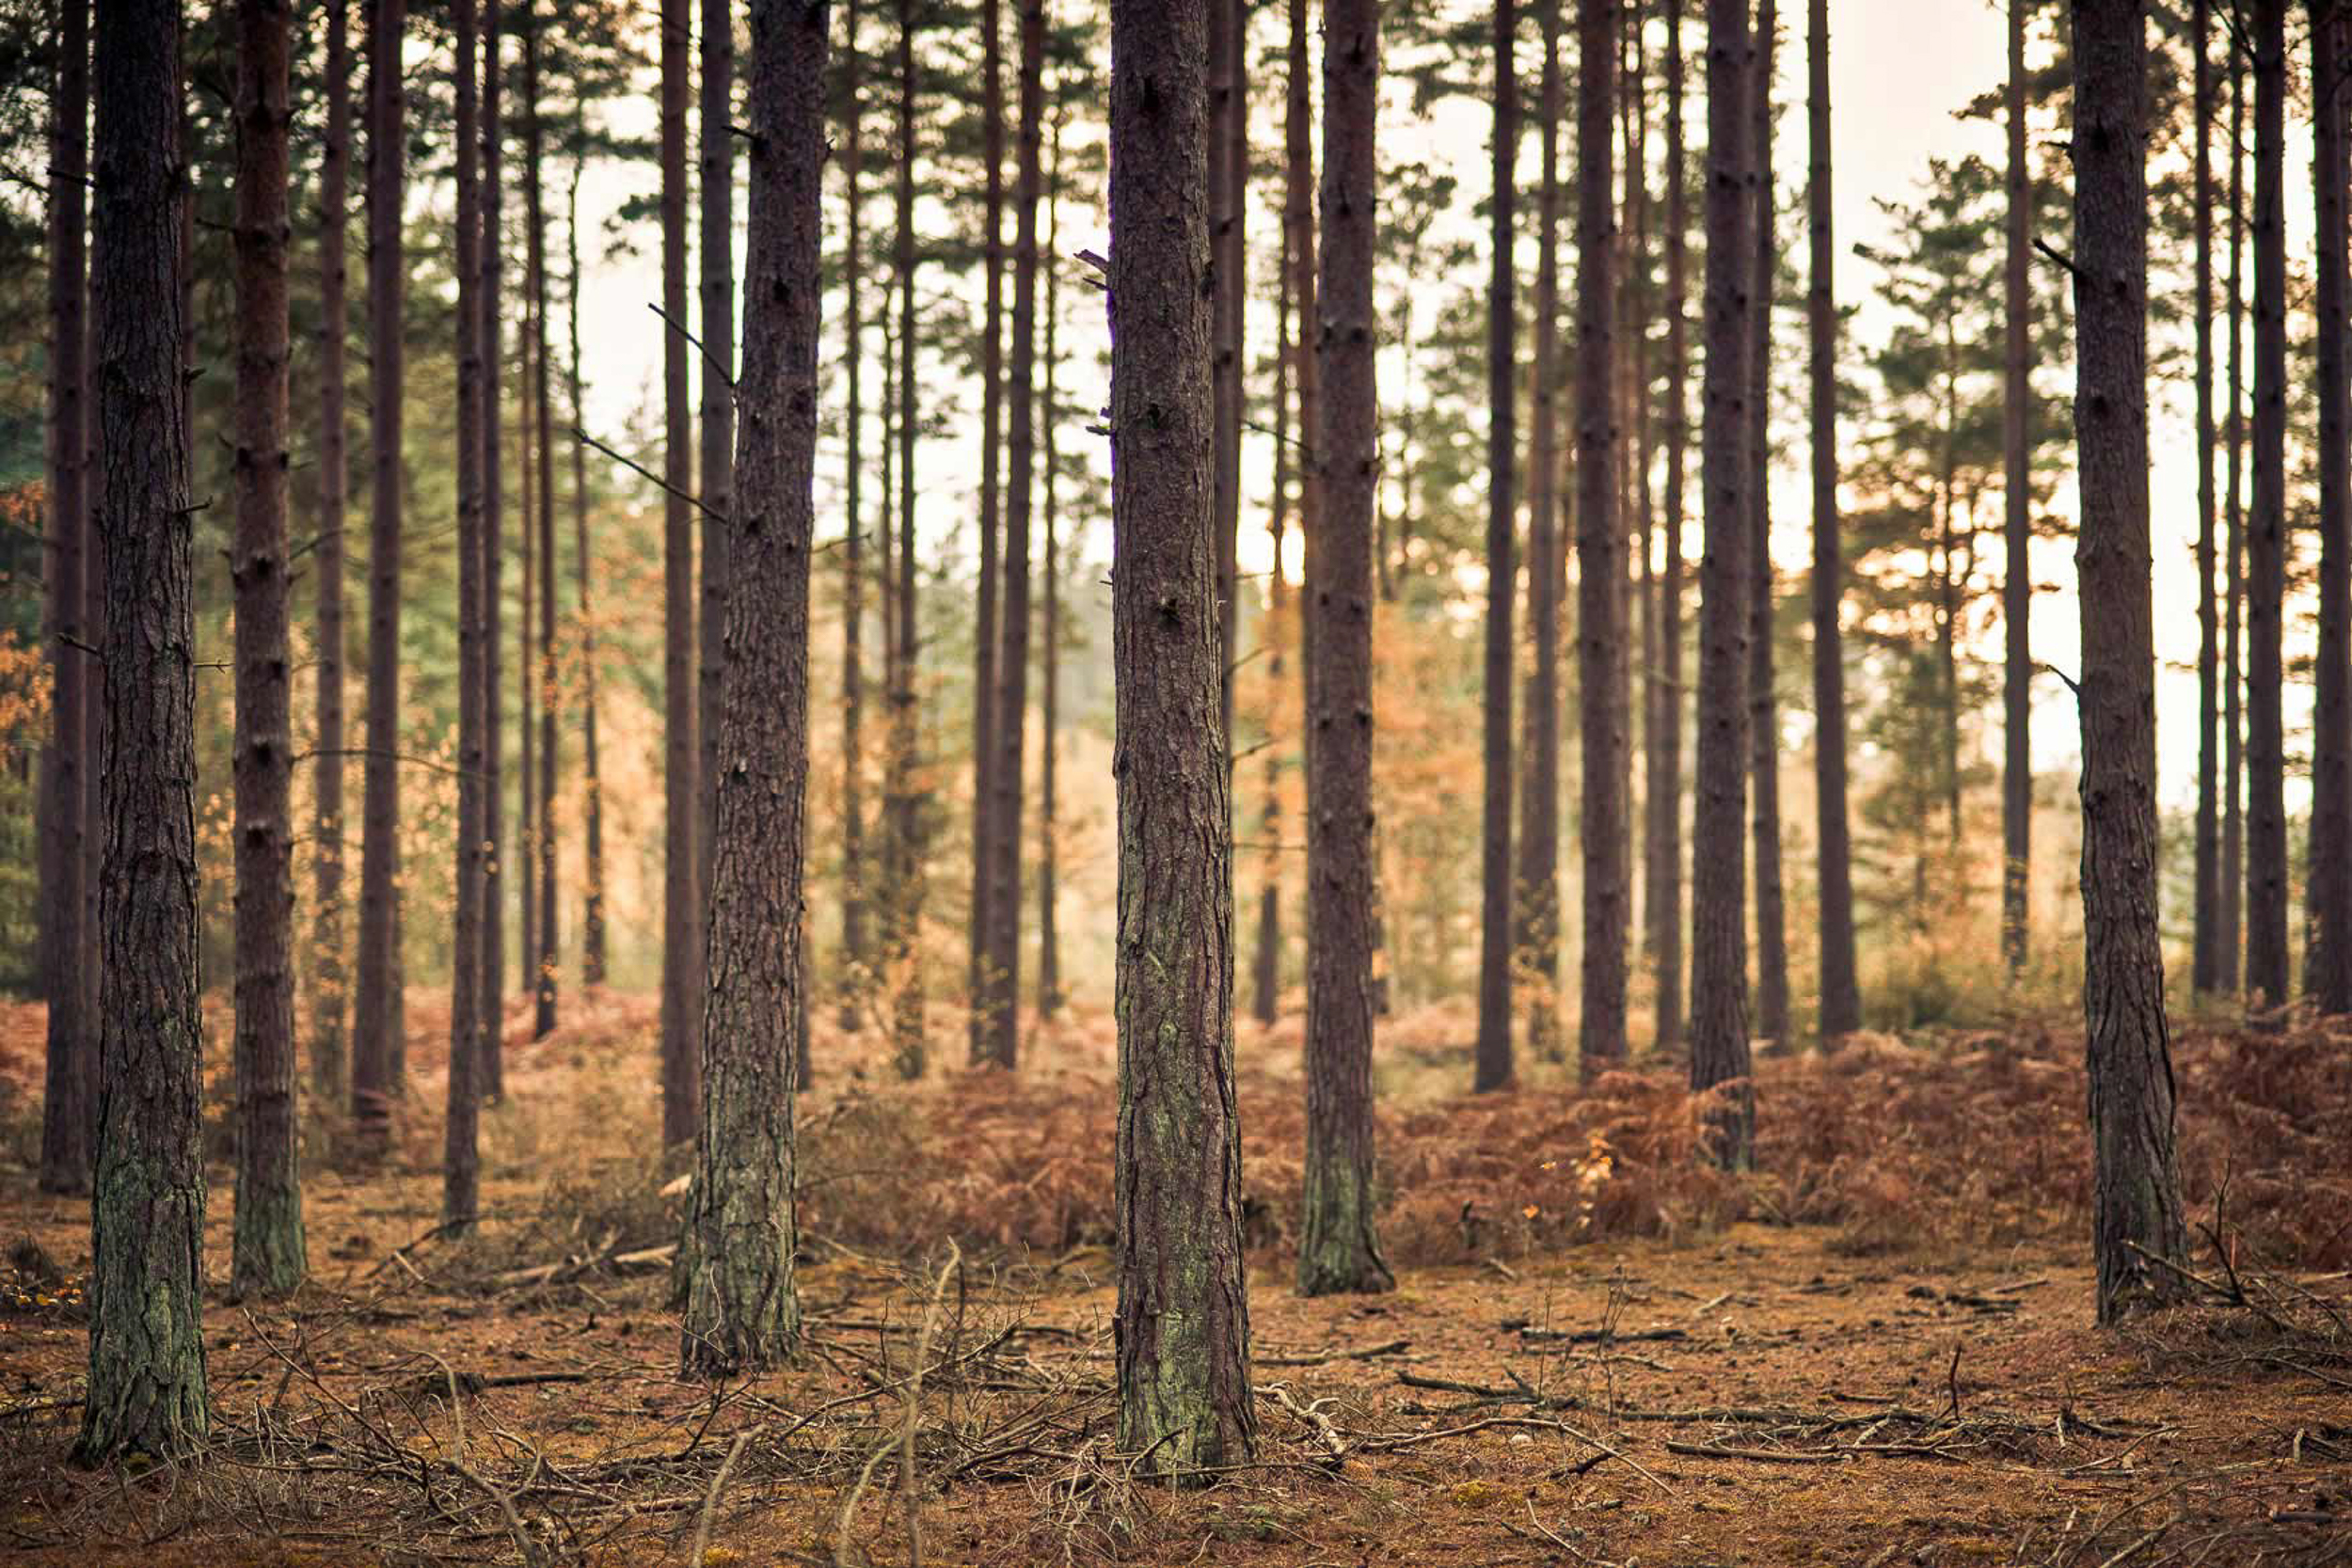 www.iaincrockart.com_landscape-Iain-Crockart-Woodland.jpg